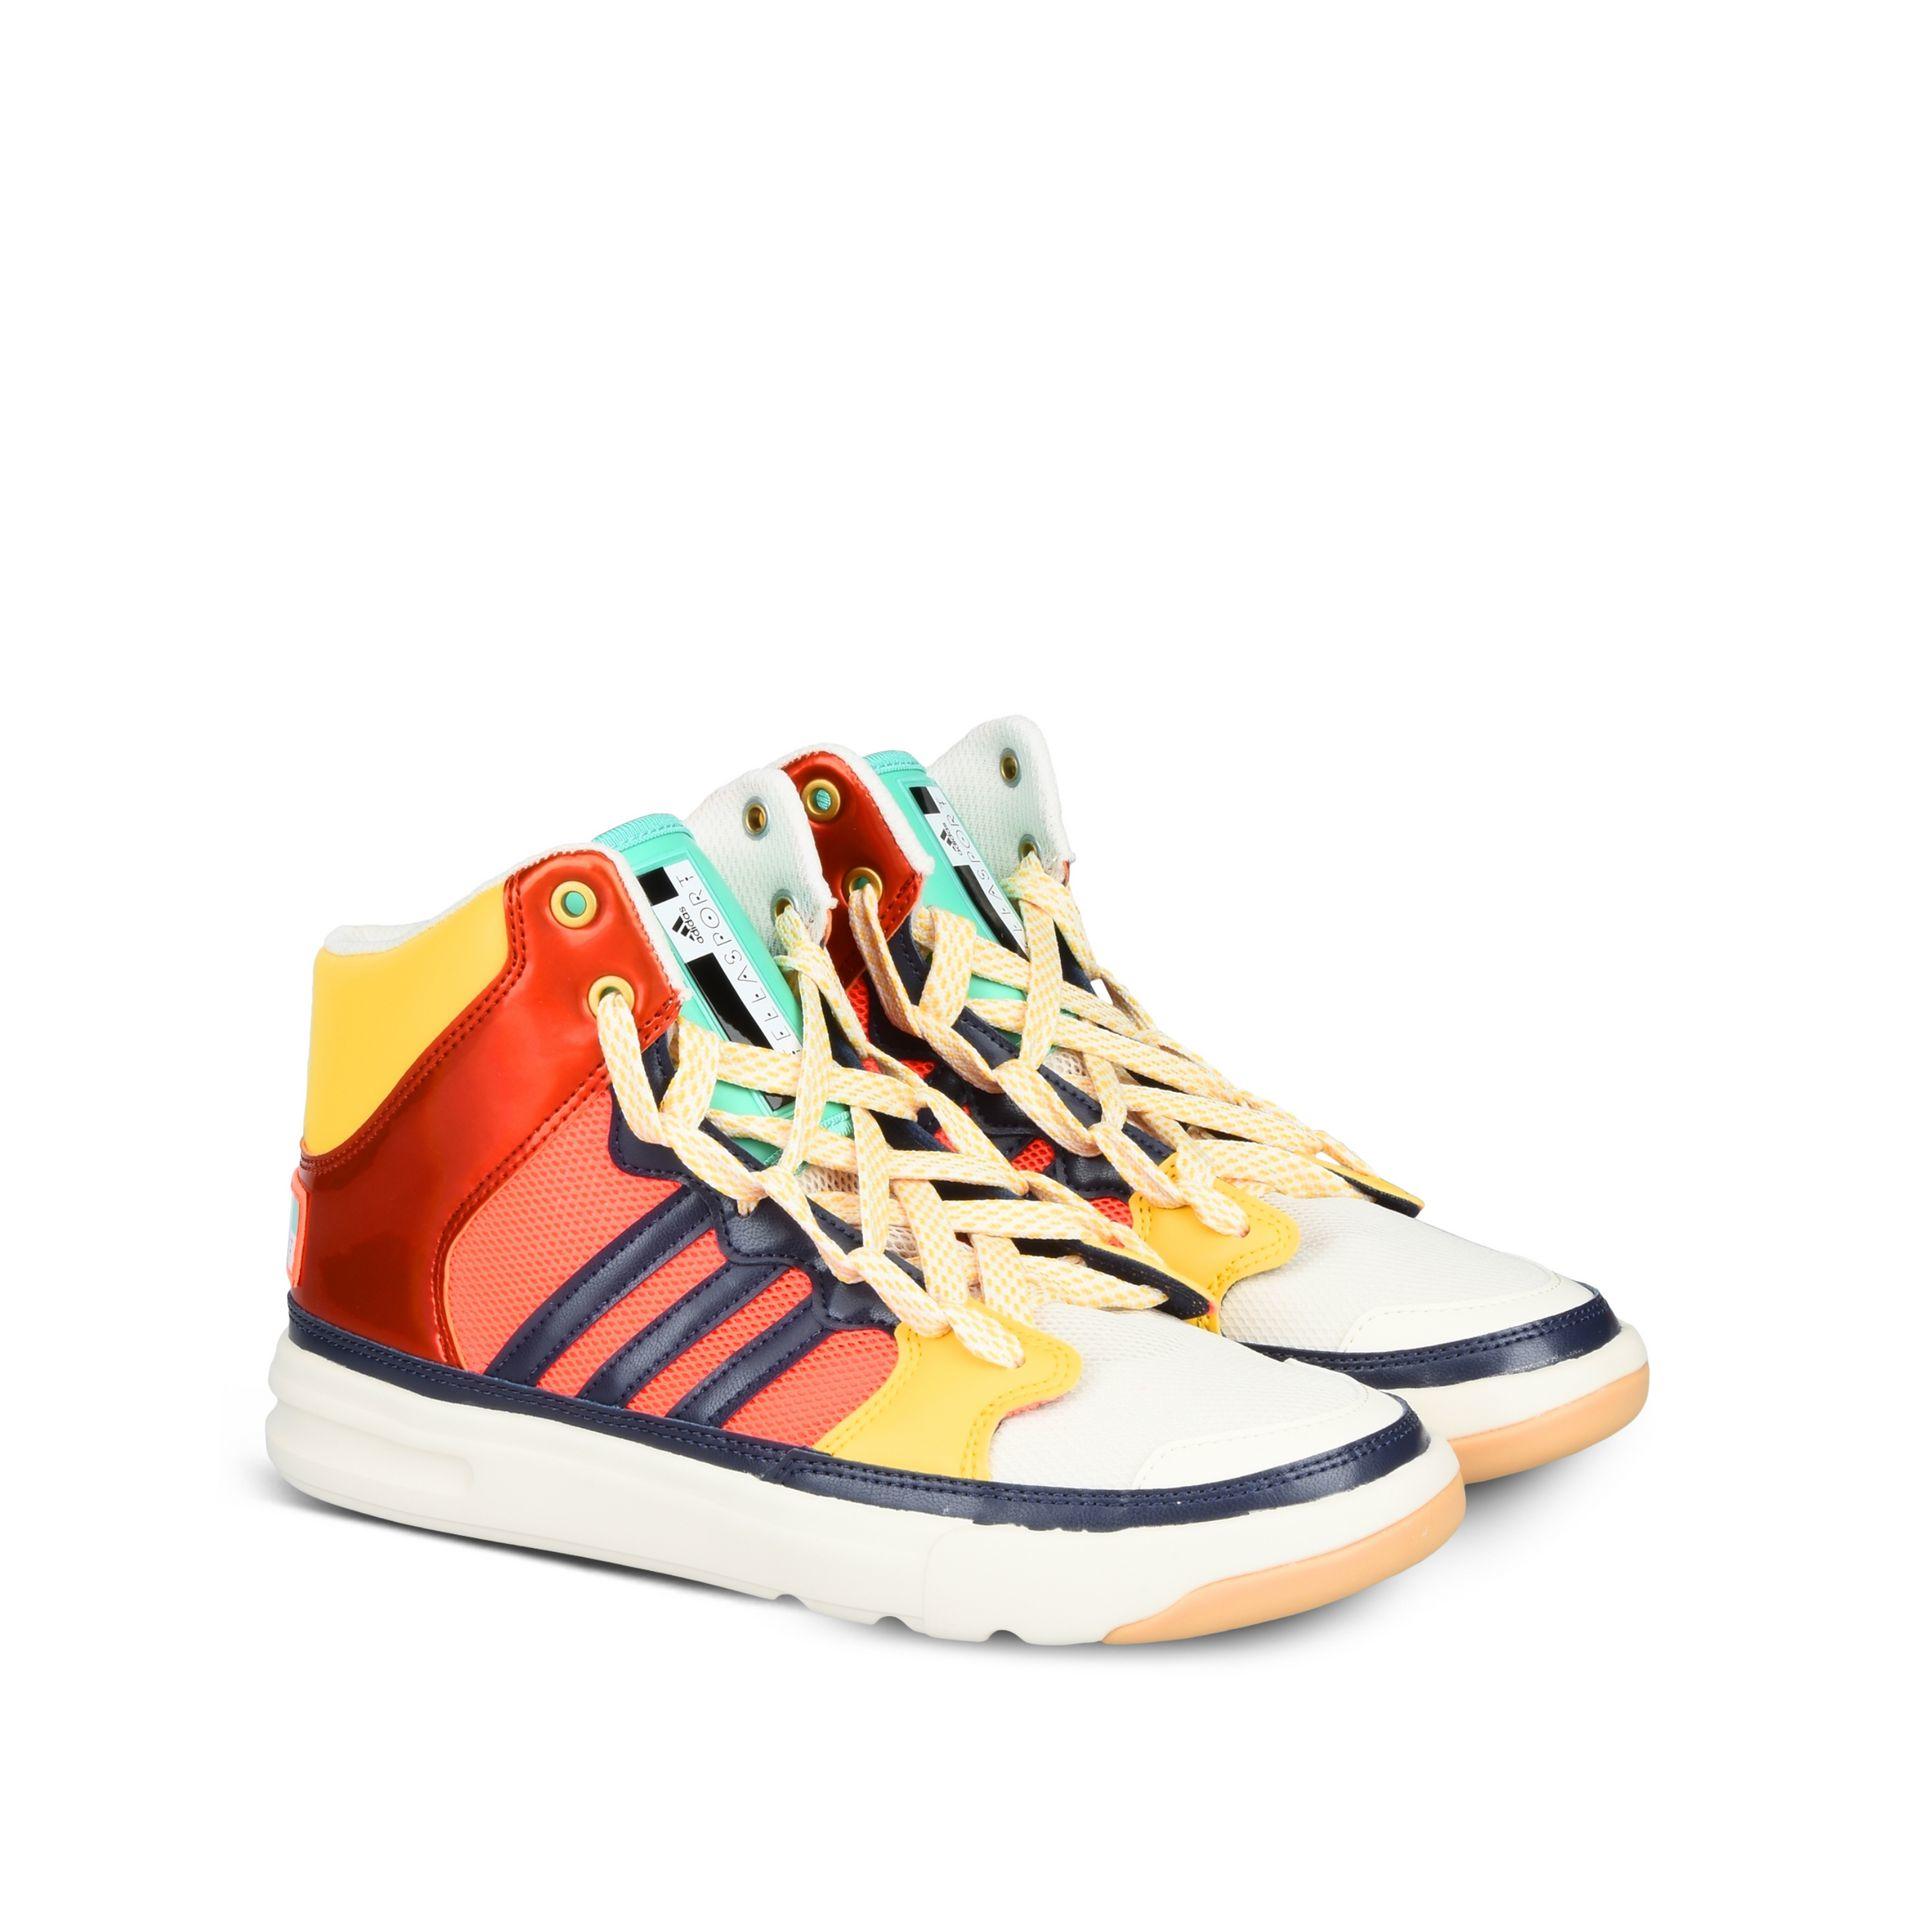 wholesale dealer 6dfee ba84d By Shoes Irana Mccartney Adidas Stella Lyst RSzZwdI